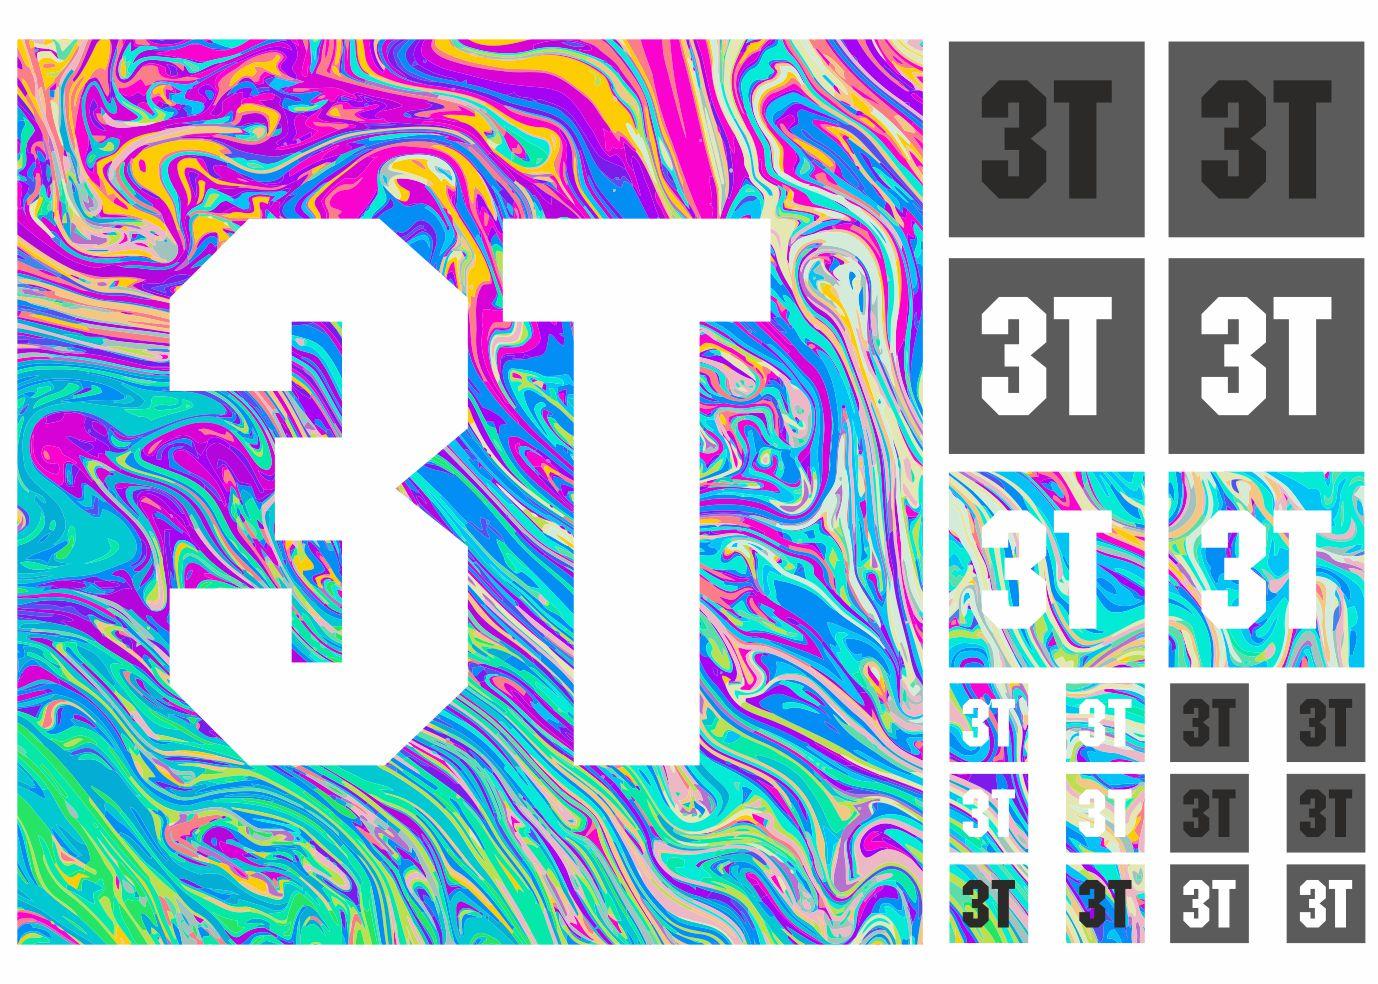 3T Bicycle Bike Frame Decals Sticker Set Adhesive Graphic Vinyl Aufkleber 19 Pcs